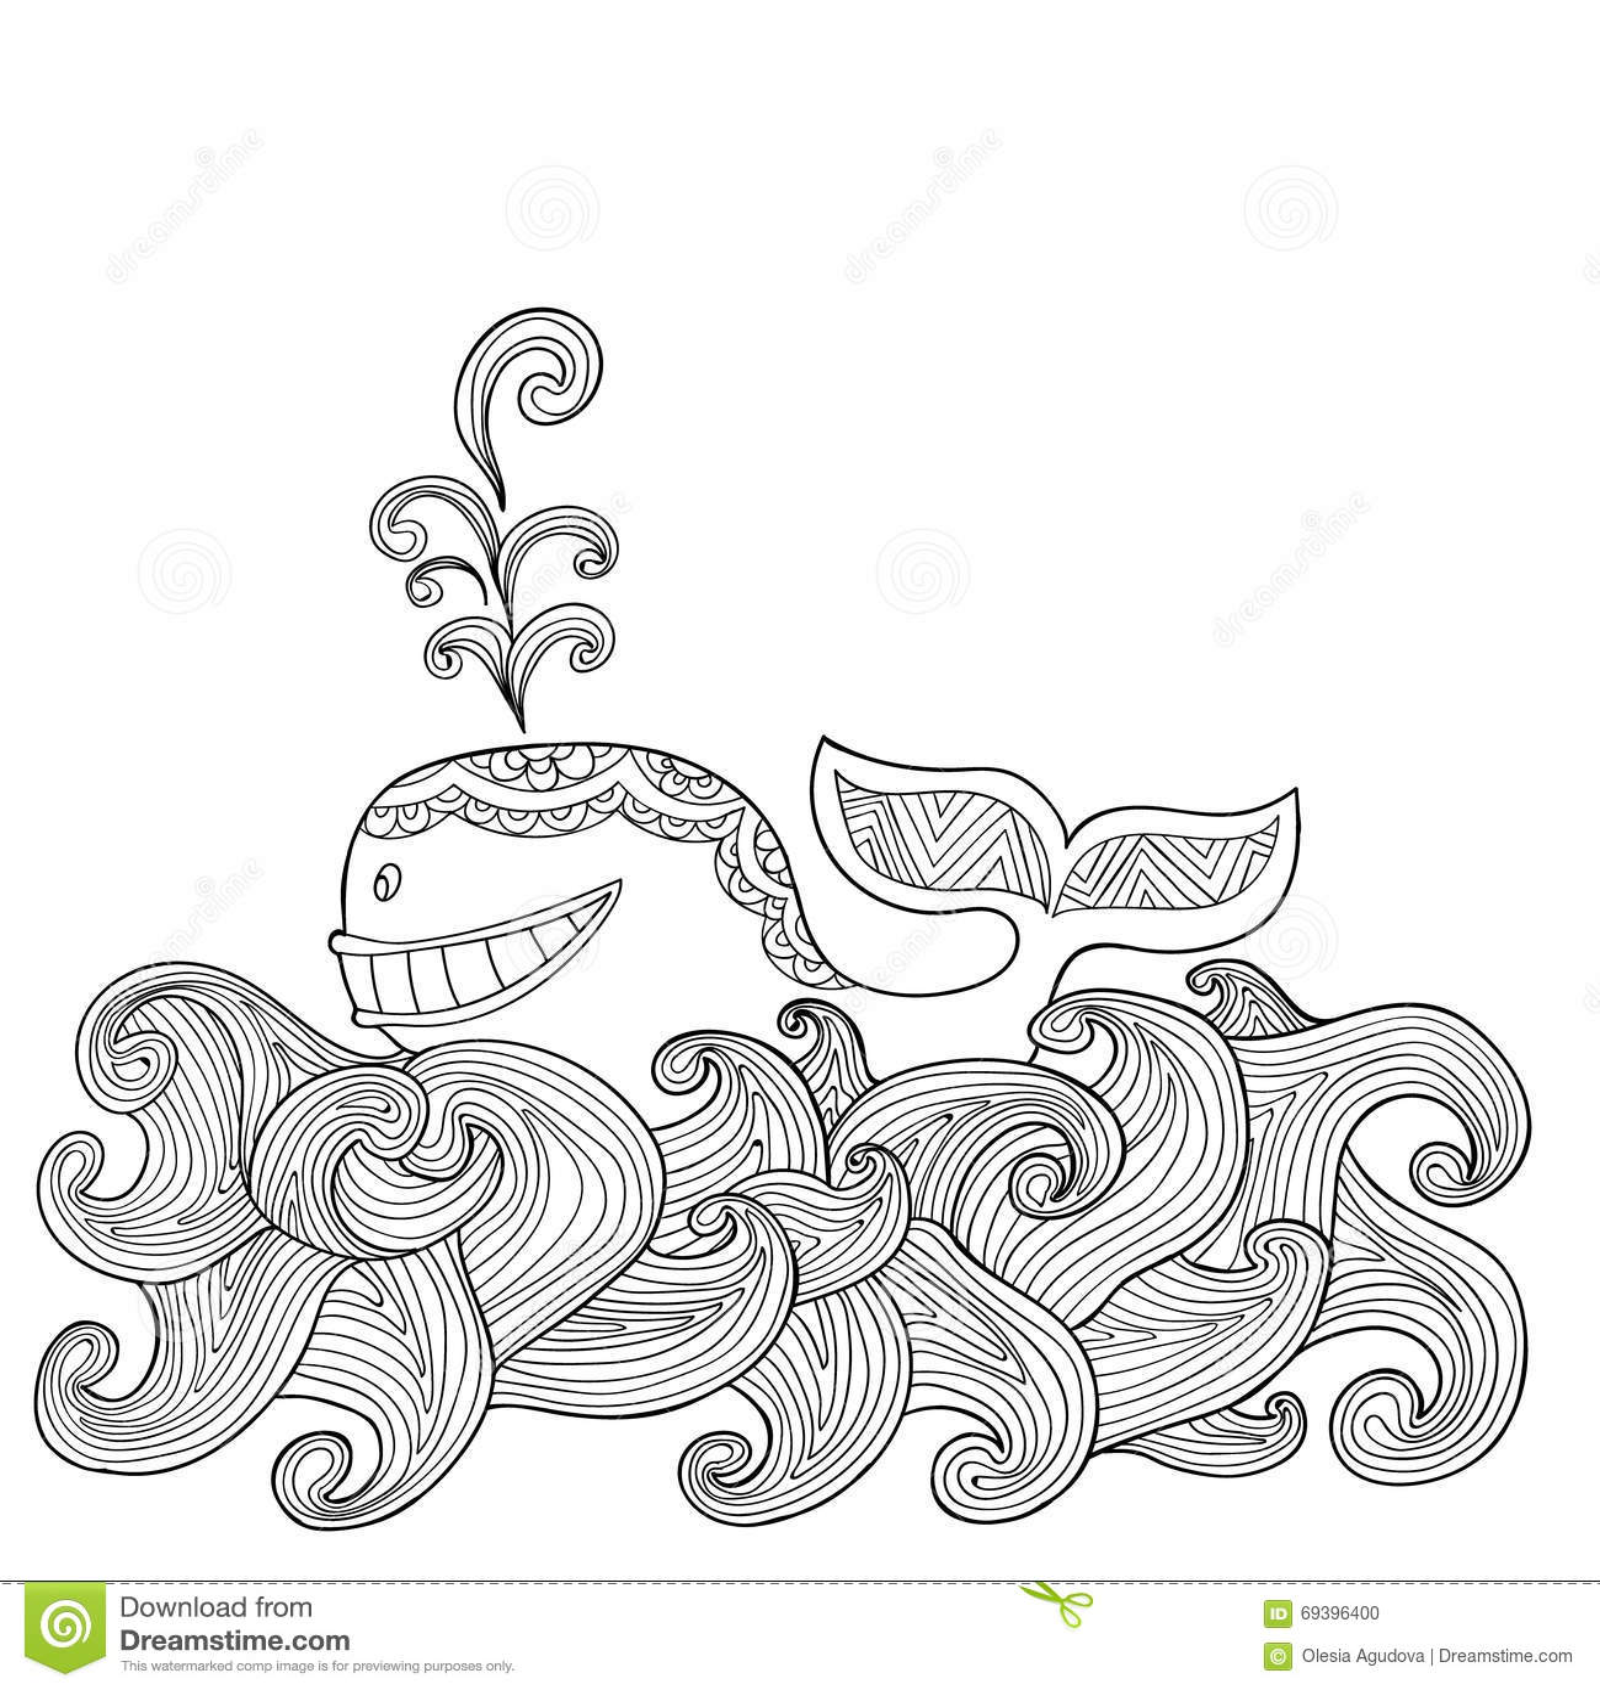 Dolphin Zentangle Vector Illustration